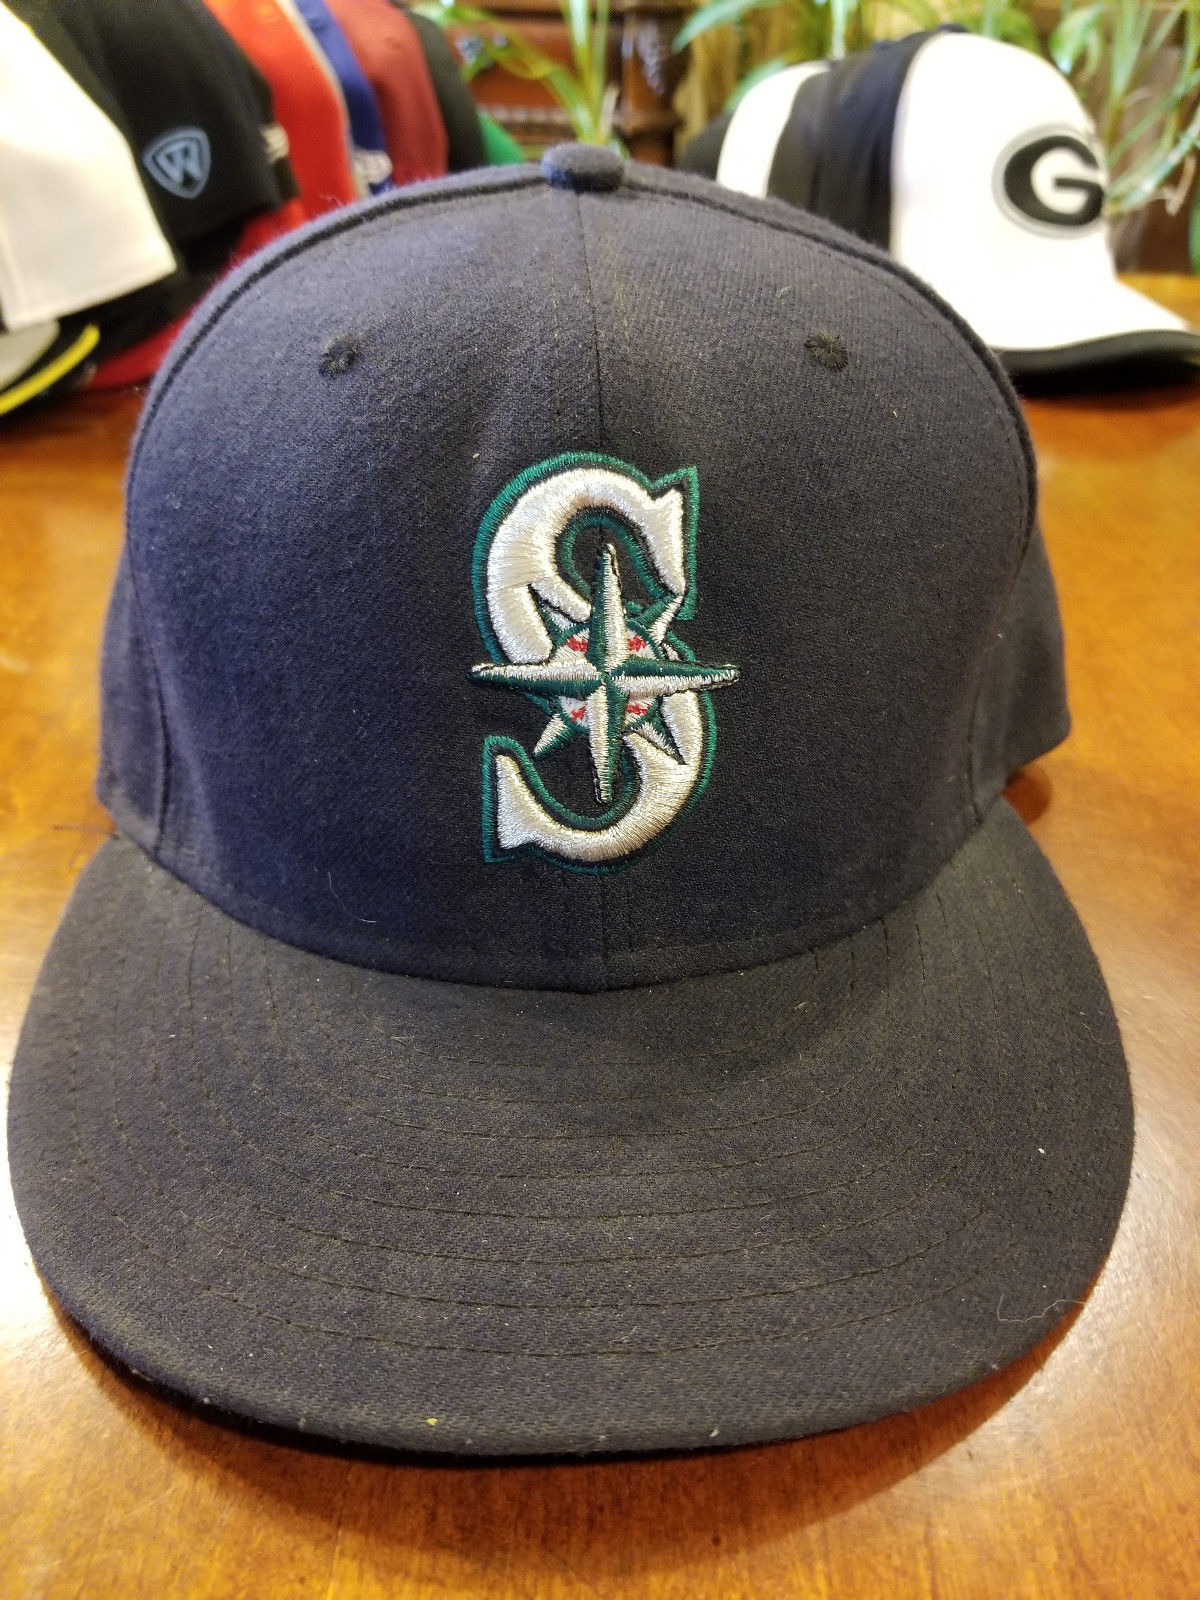 81e98ff621f S l1600. S l1600. Seattle Mariners Black Fitted Baseball Cap Hat New Era  Size 7 ...